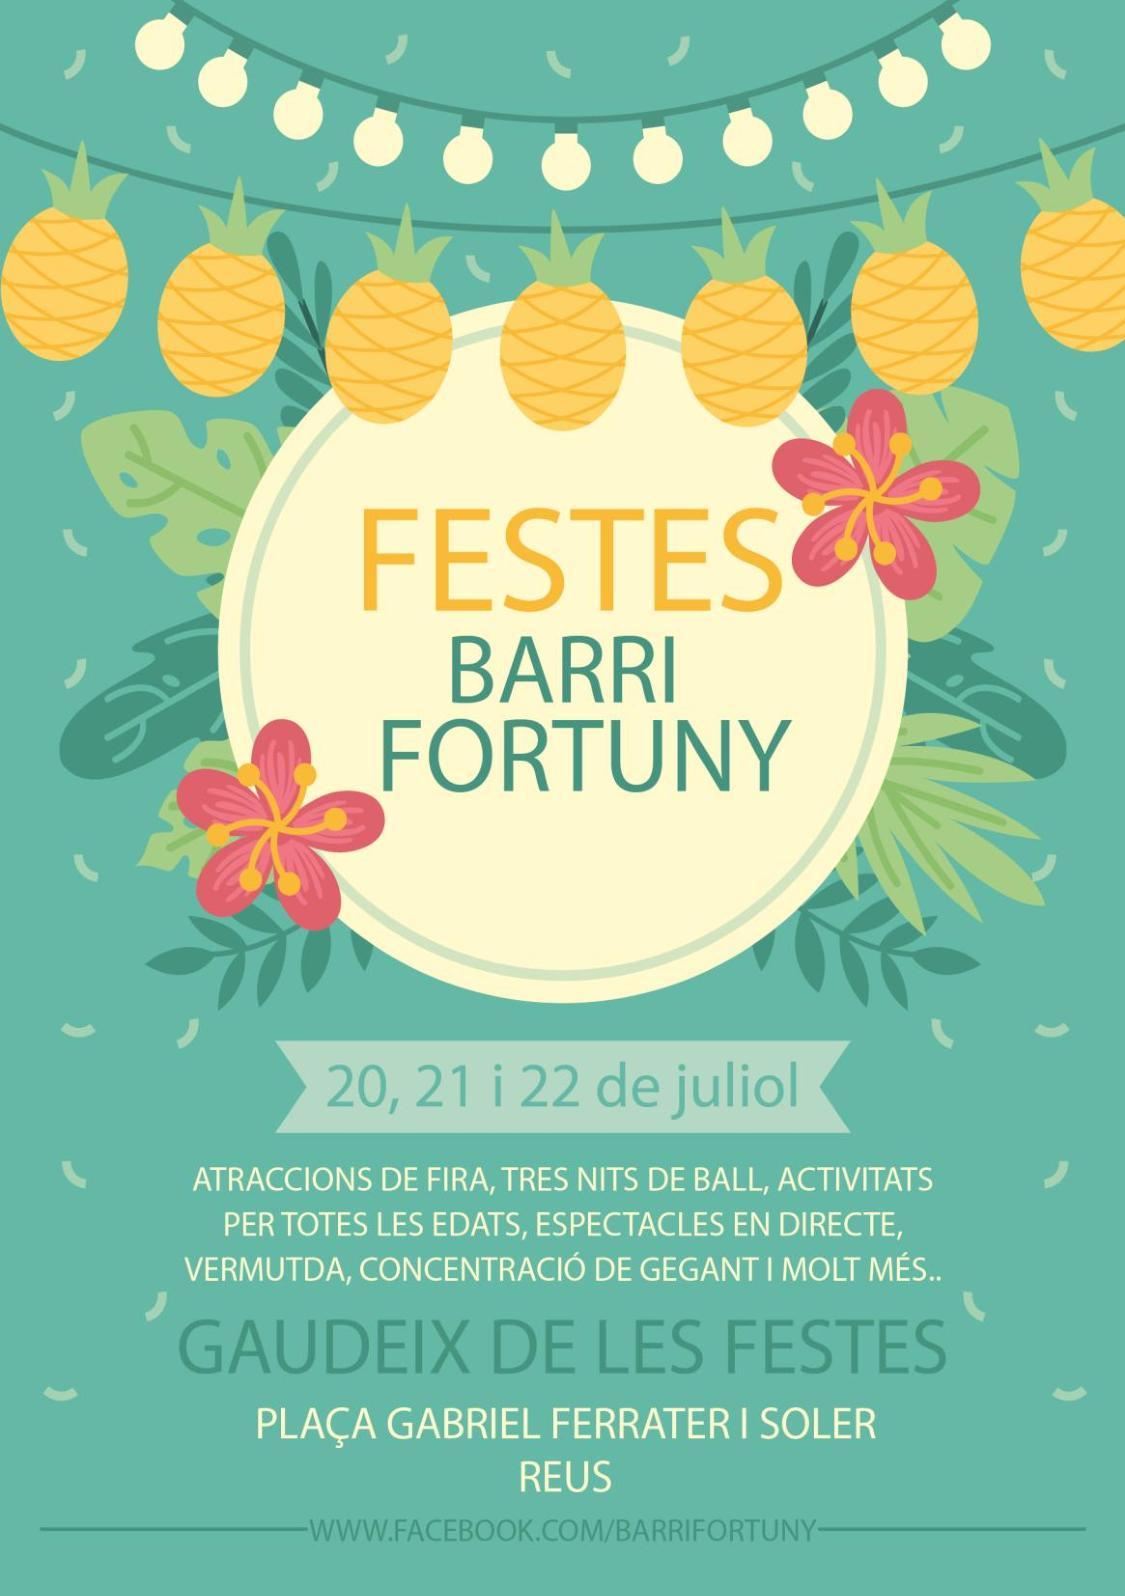 PROGRMA FESTES BARRI FORTUNY 2018